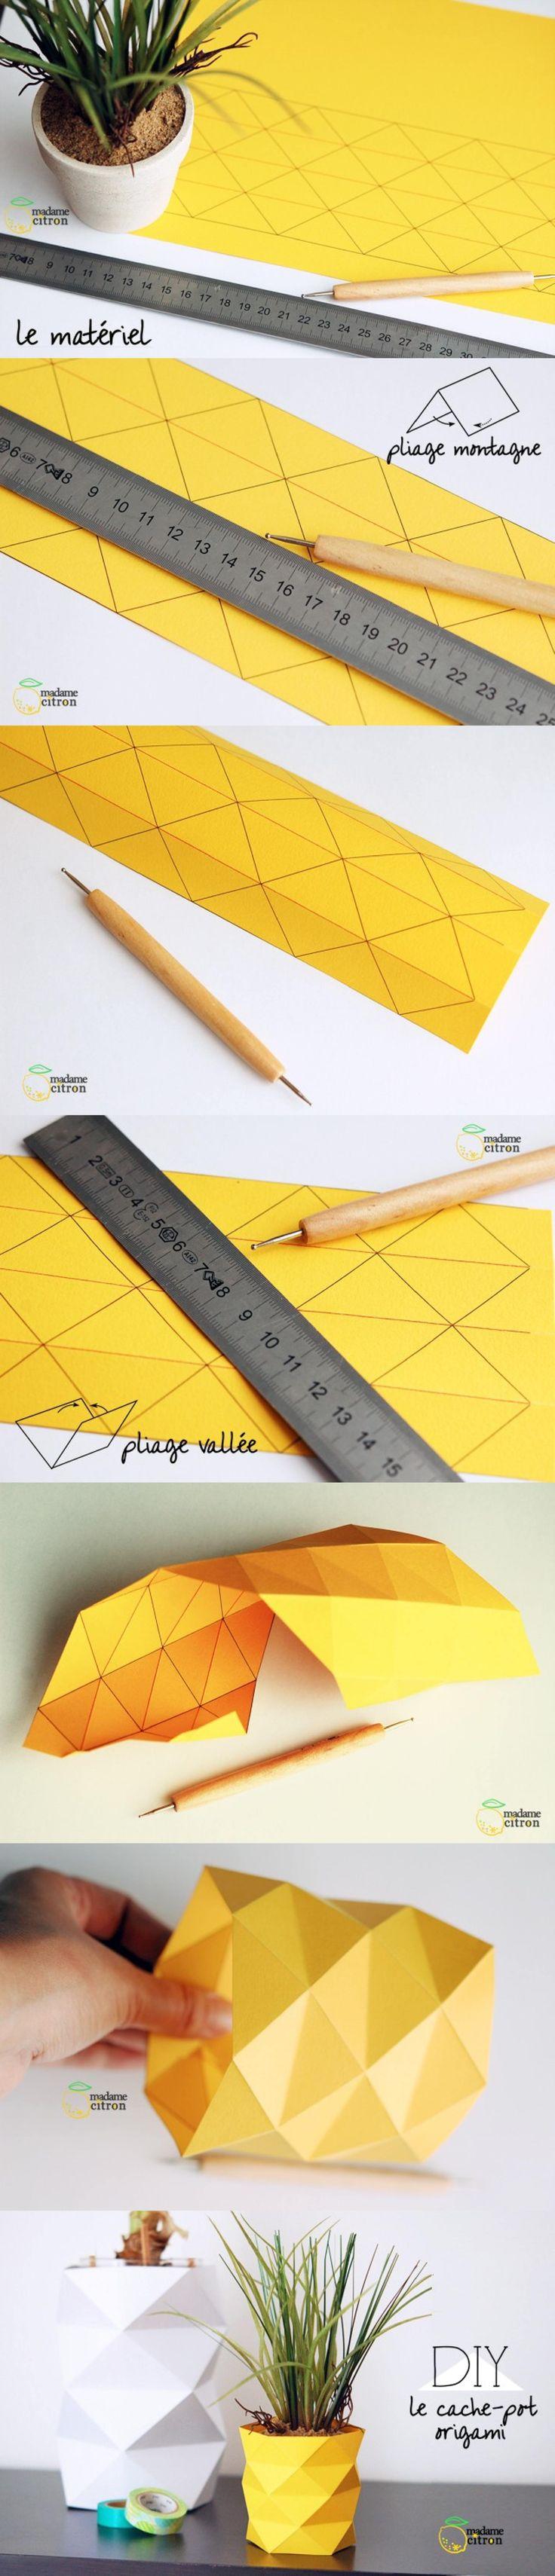 decorar maceta origami DIY muy ingenioso 2